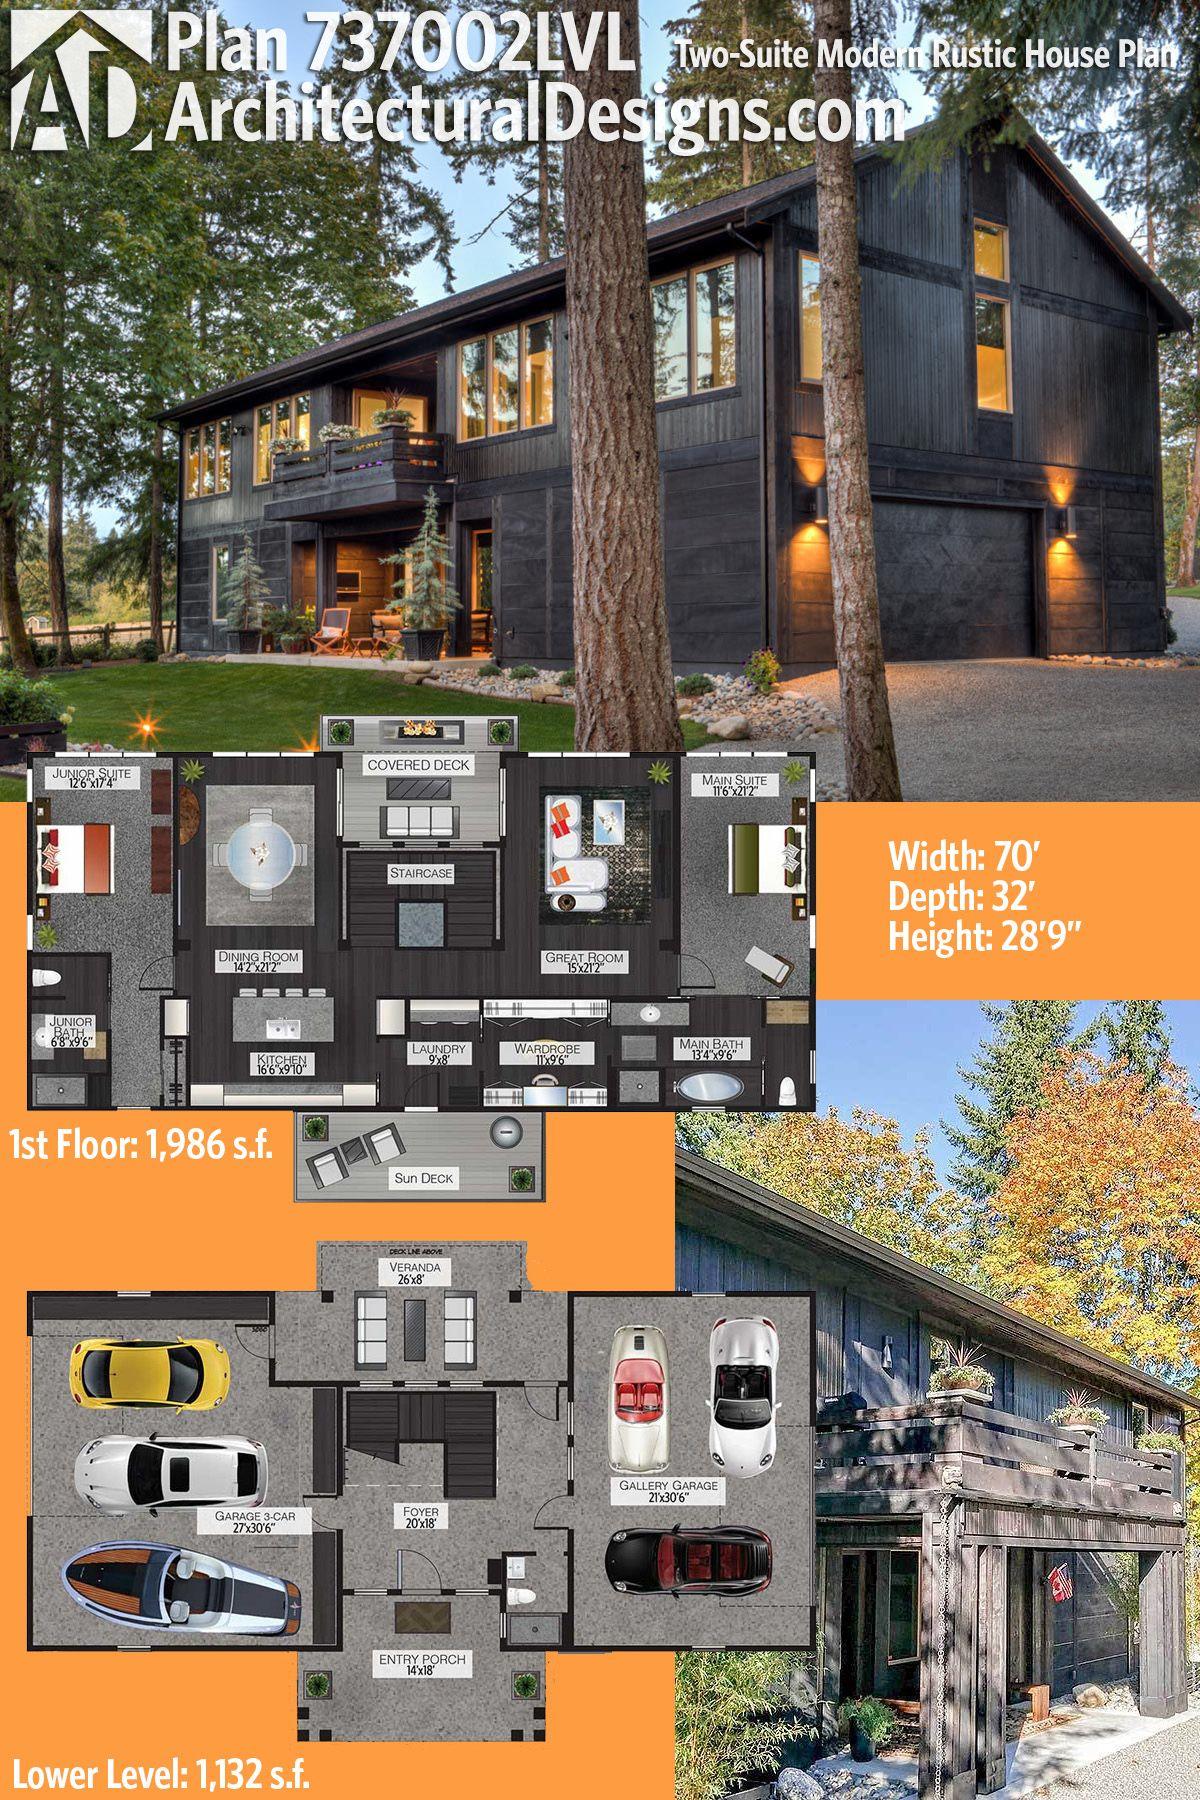 Plan LVL Two Suite Modern Rustic House Plan